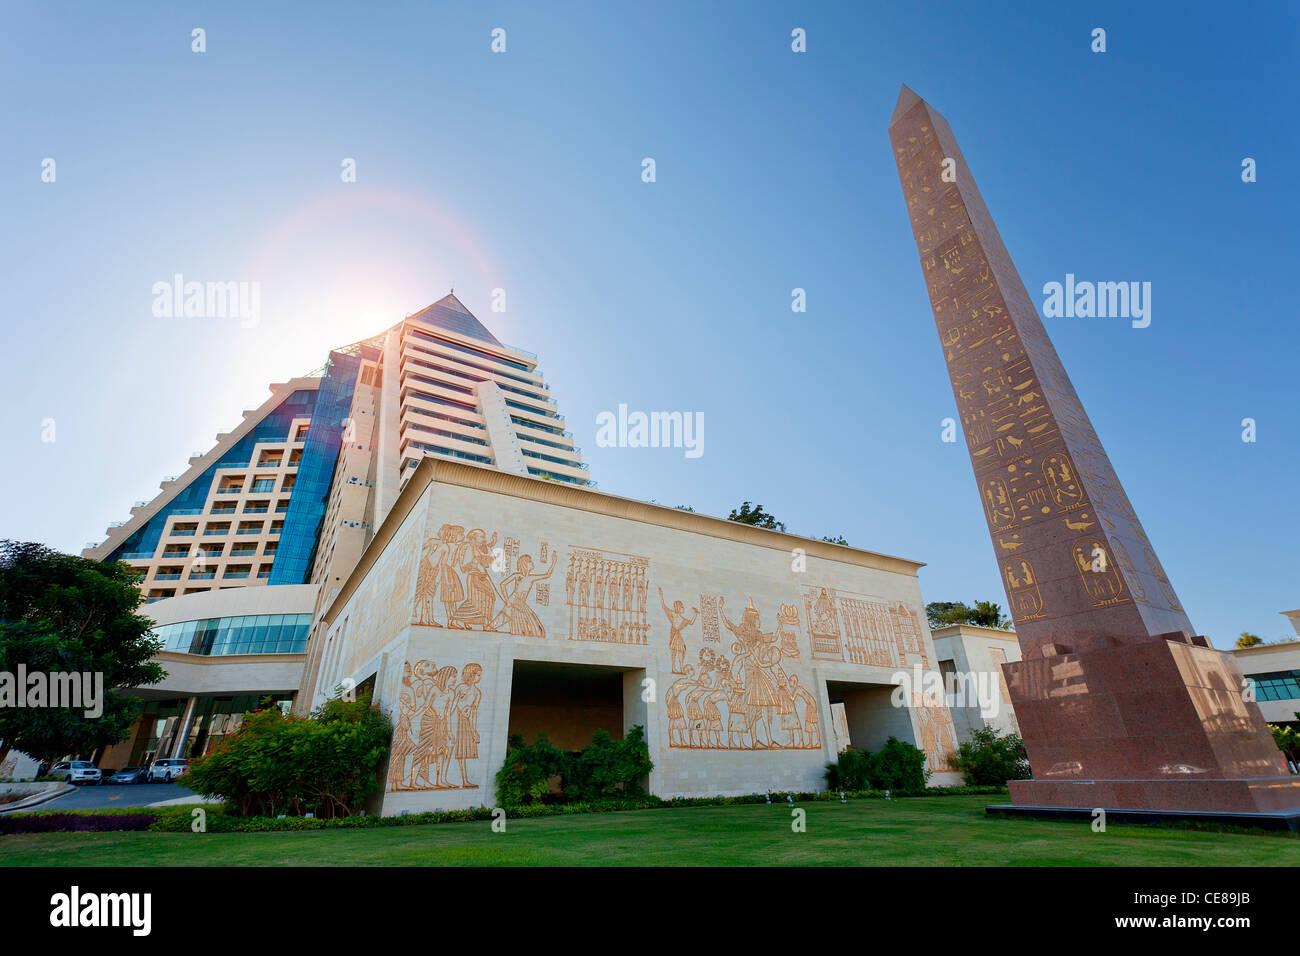 Dubai, Wafi City and Raffles Hotel - Stock Image